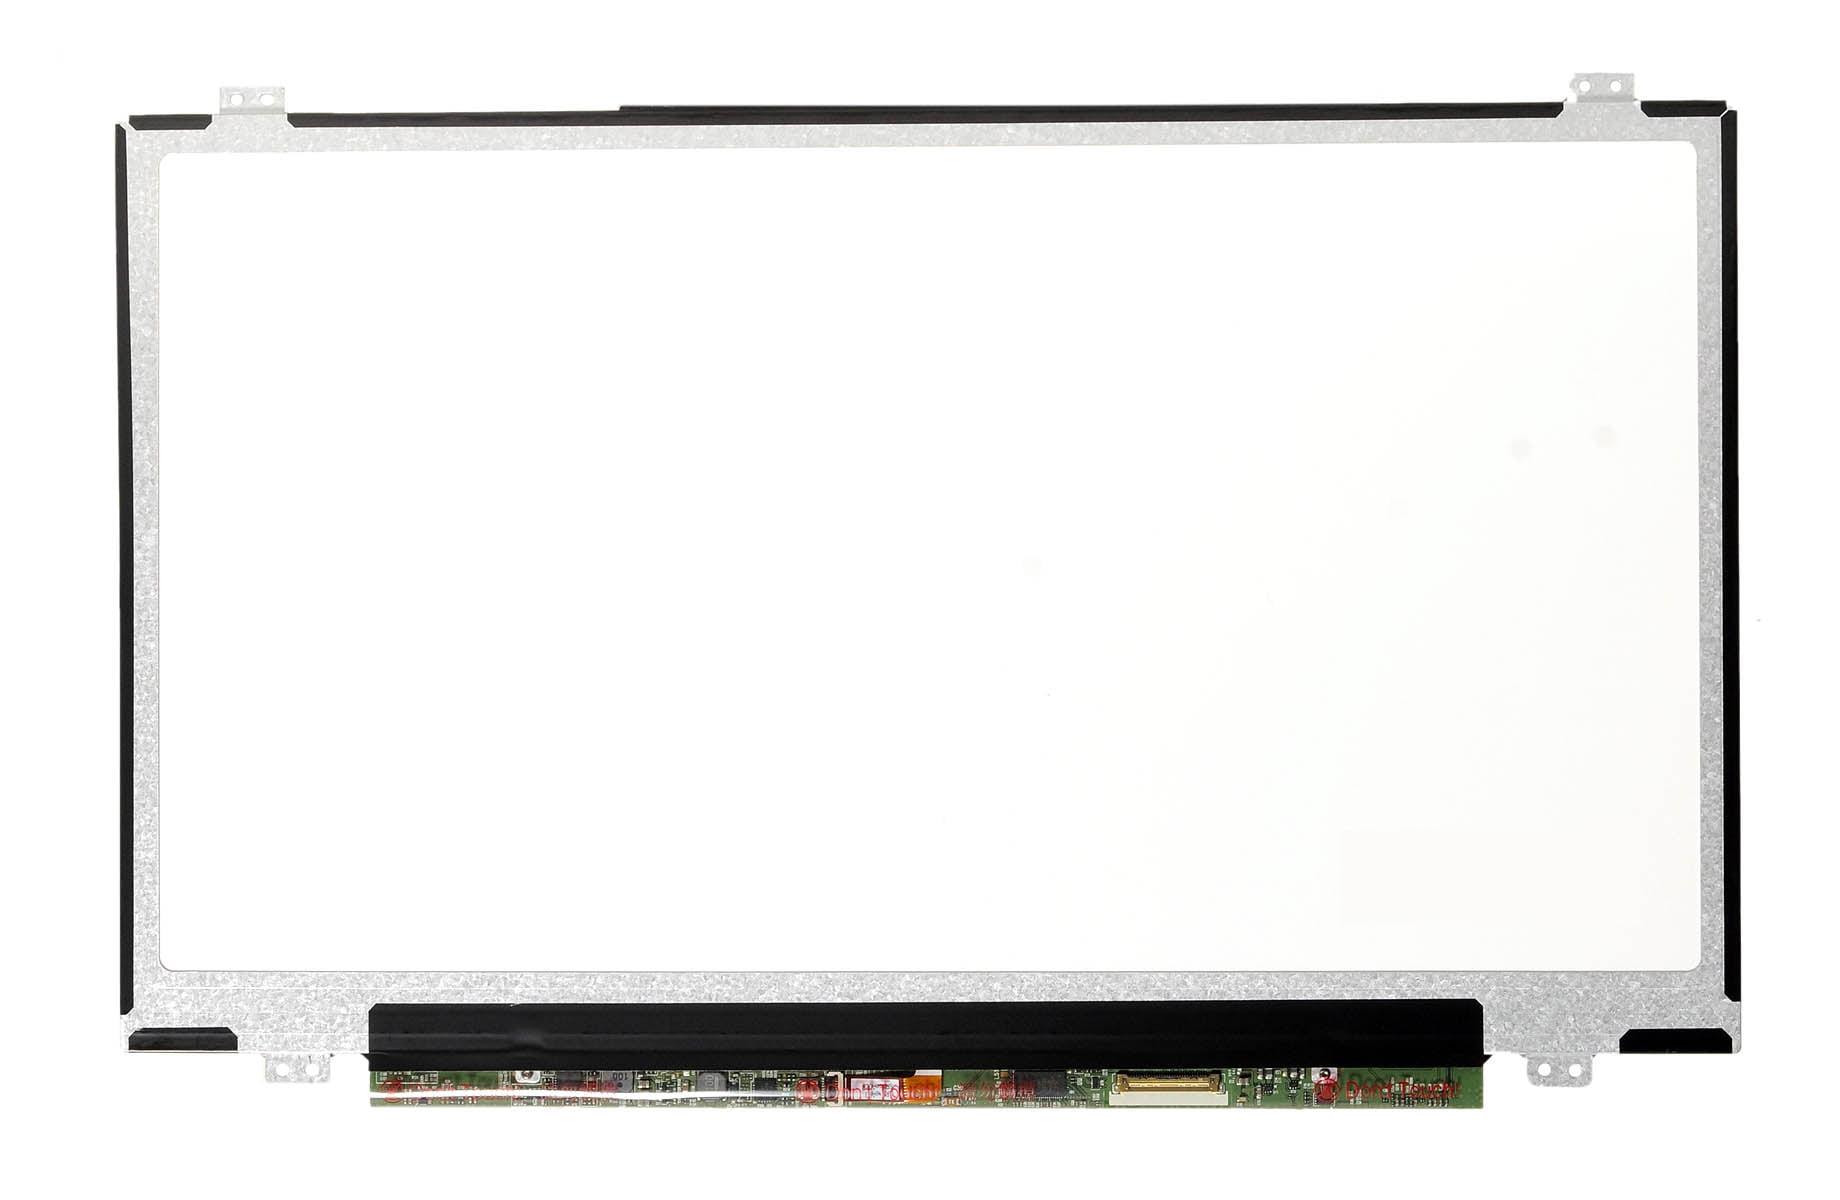 Sony VAIO SVF143 SERIES 14.0